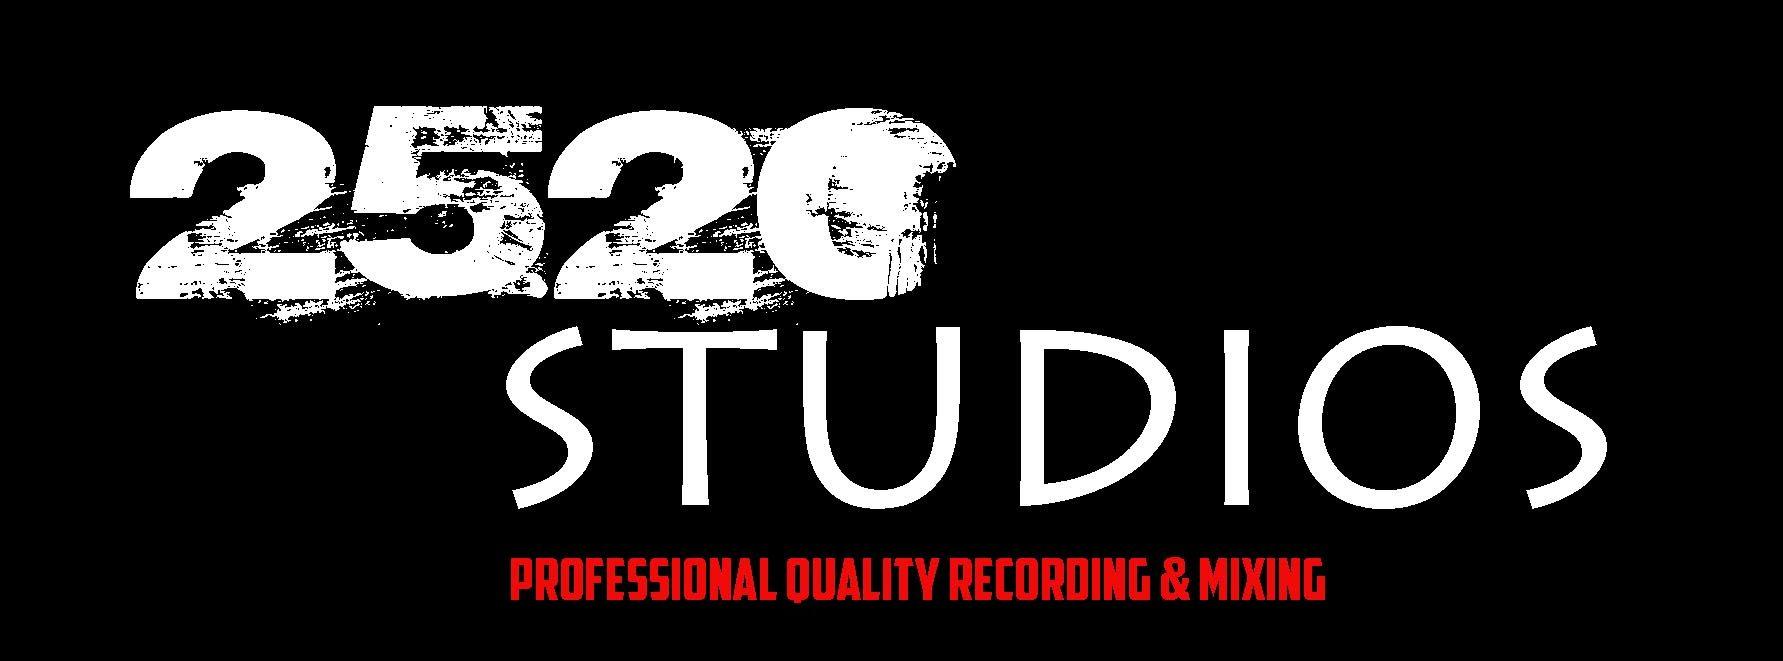 2520 Studios